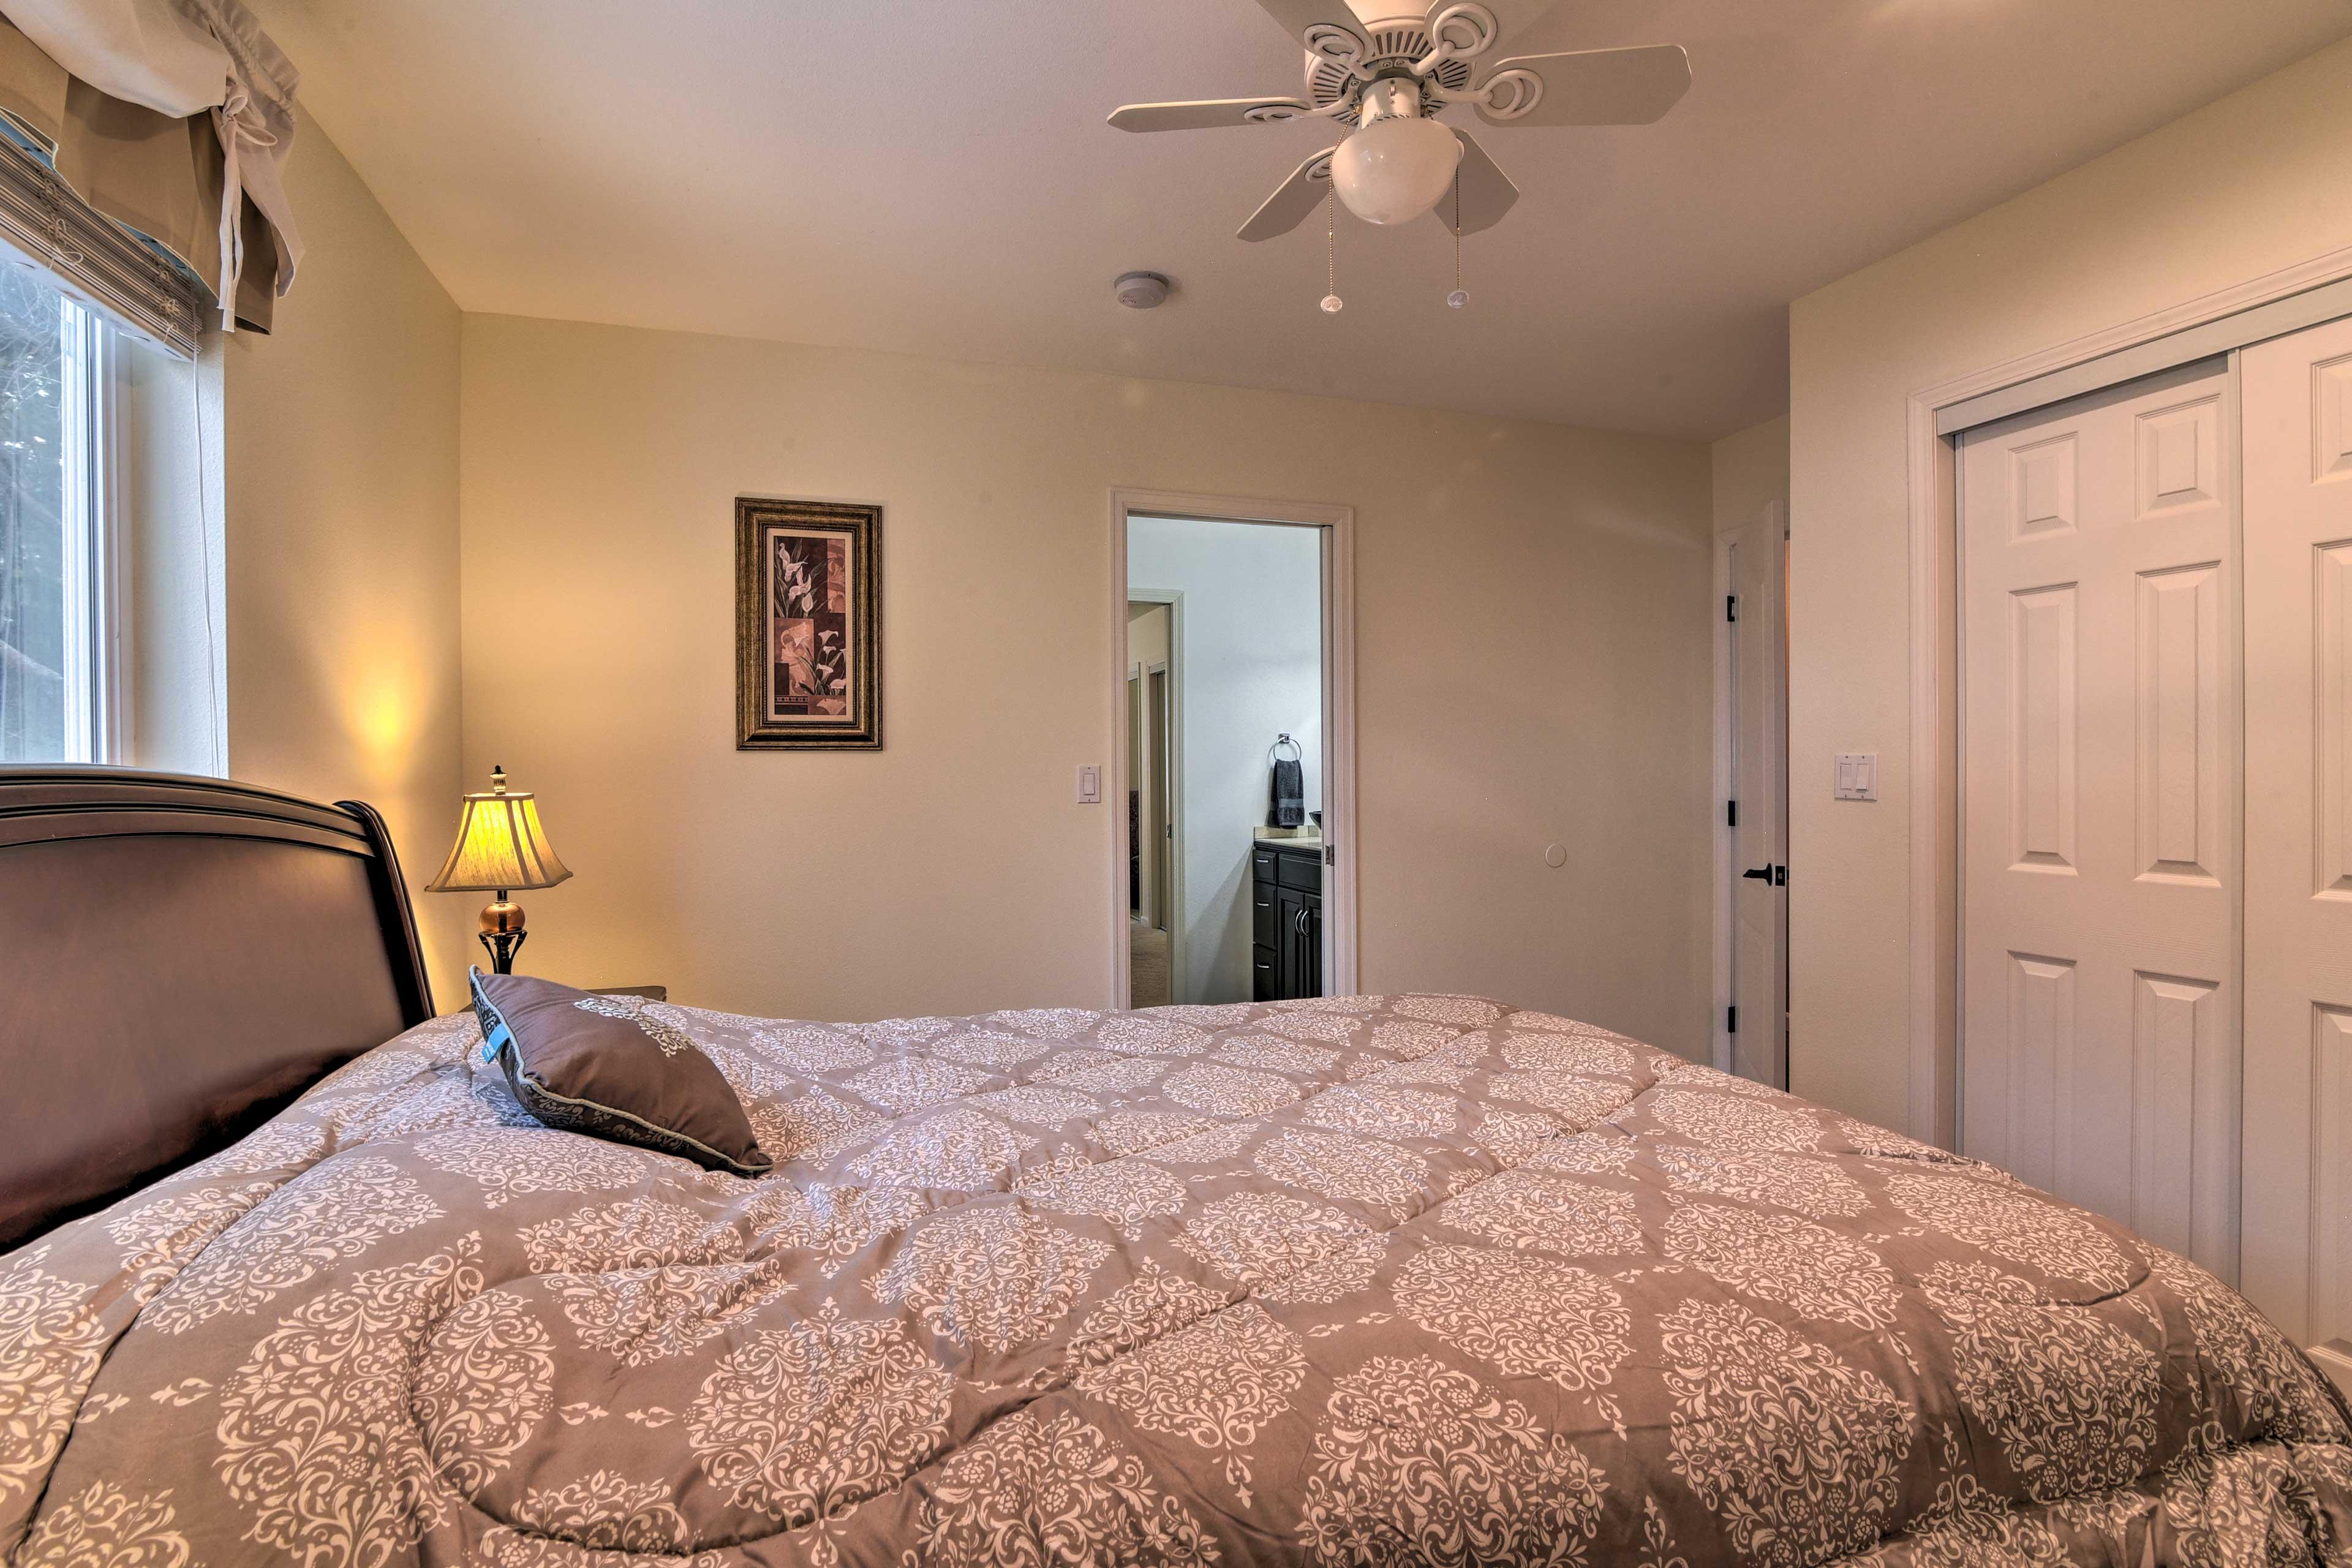 All of the bedrooms feature en-suite bathrooms.